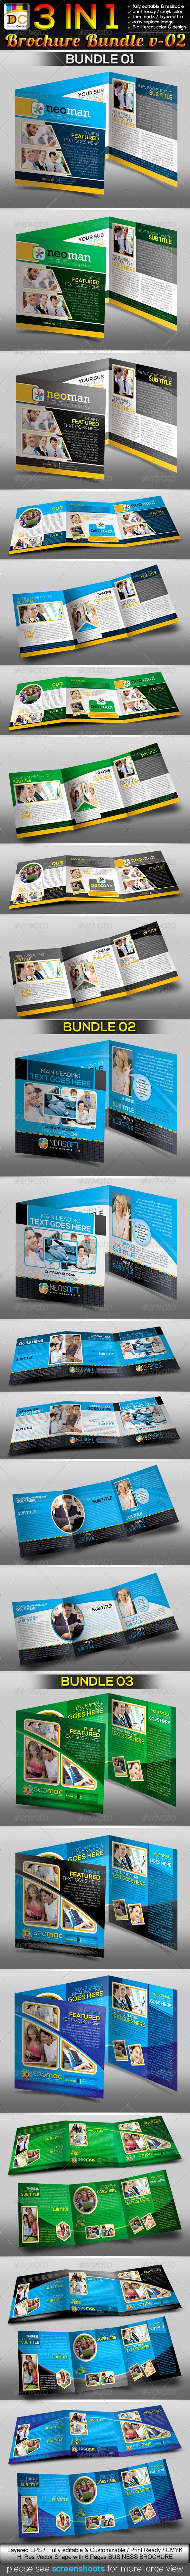 3in1 : Corporate Tri-fold Business Brochure Bundle - Corporate Brochures